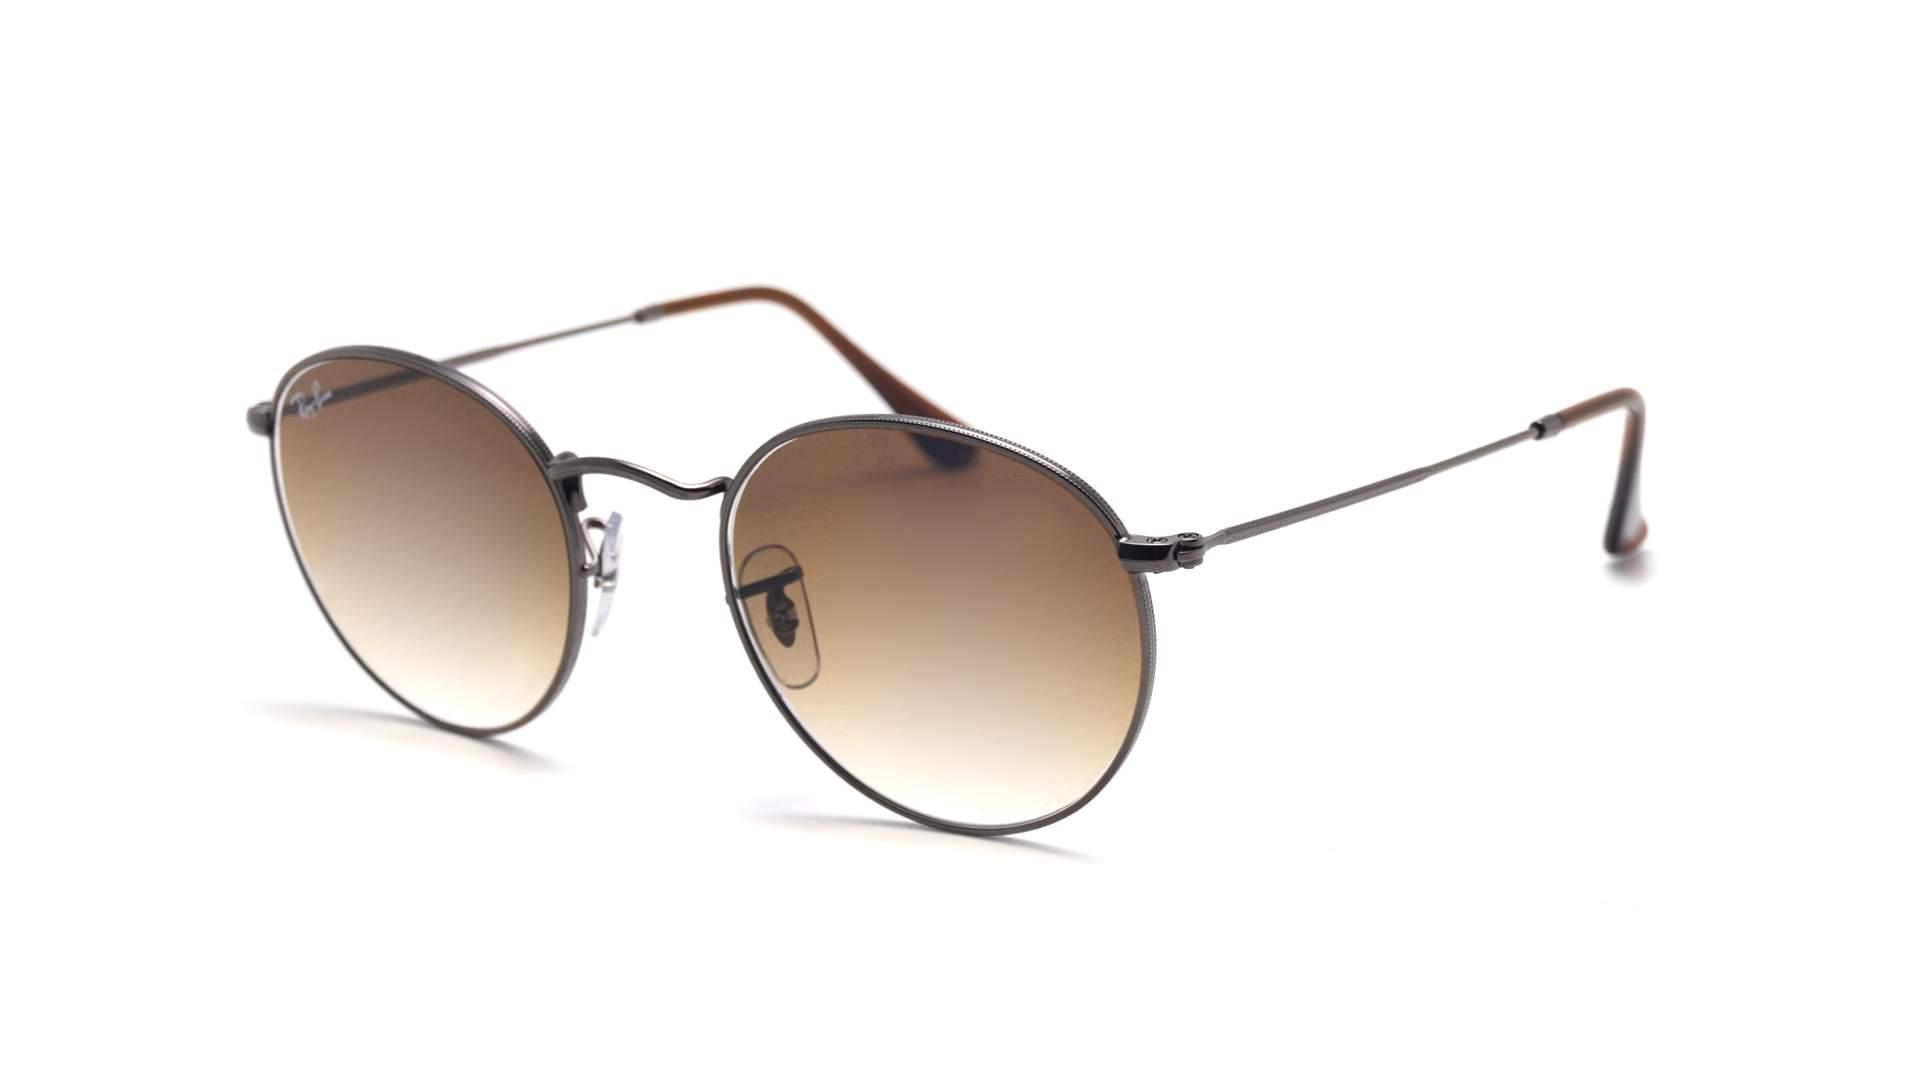 3733c29ebc5 Sunglasses Ray-Ban Round metal Gun Flat Lenses Grey RB3447N 004 51 50-21  Medium Gradient